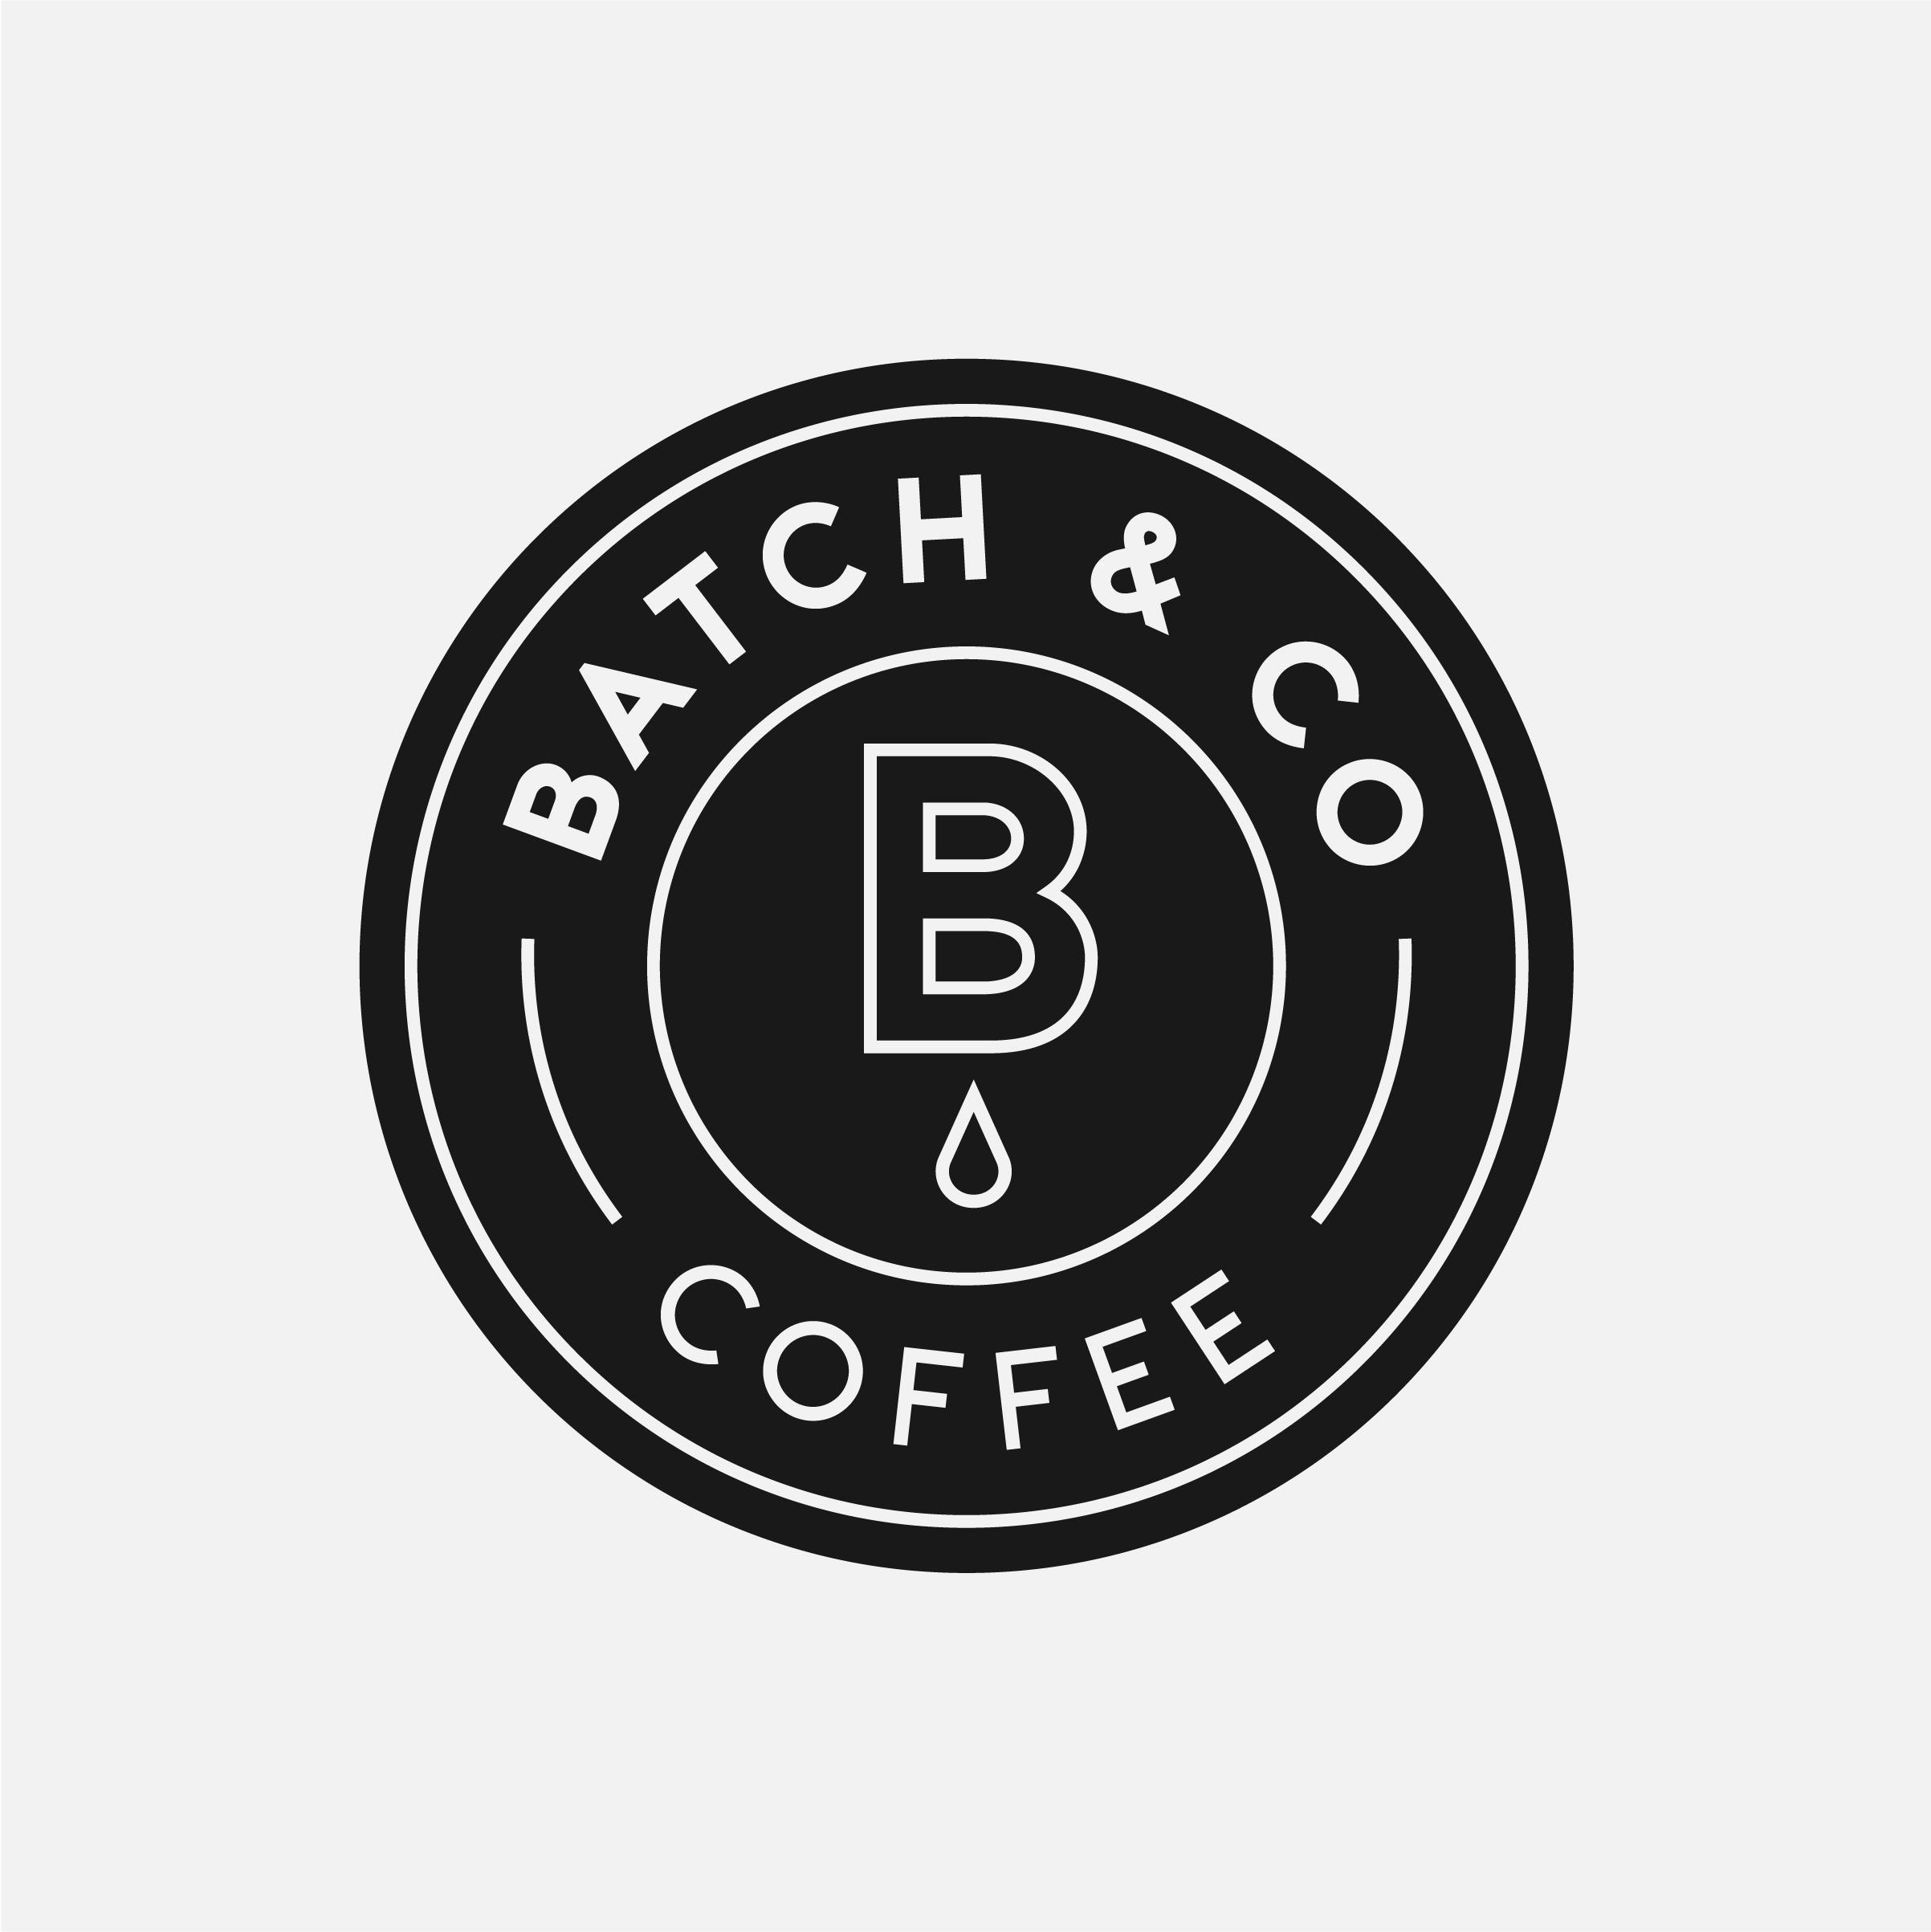 Batch&Co logo